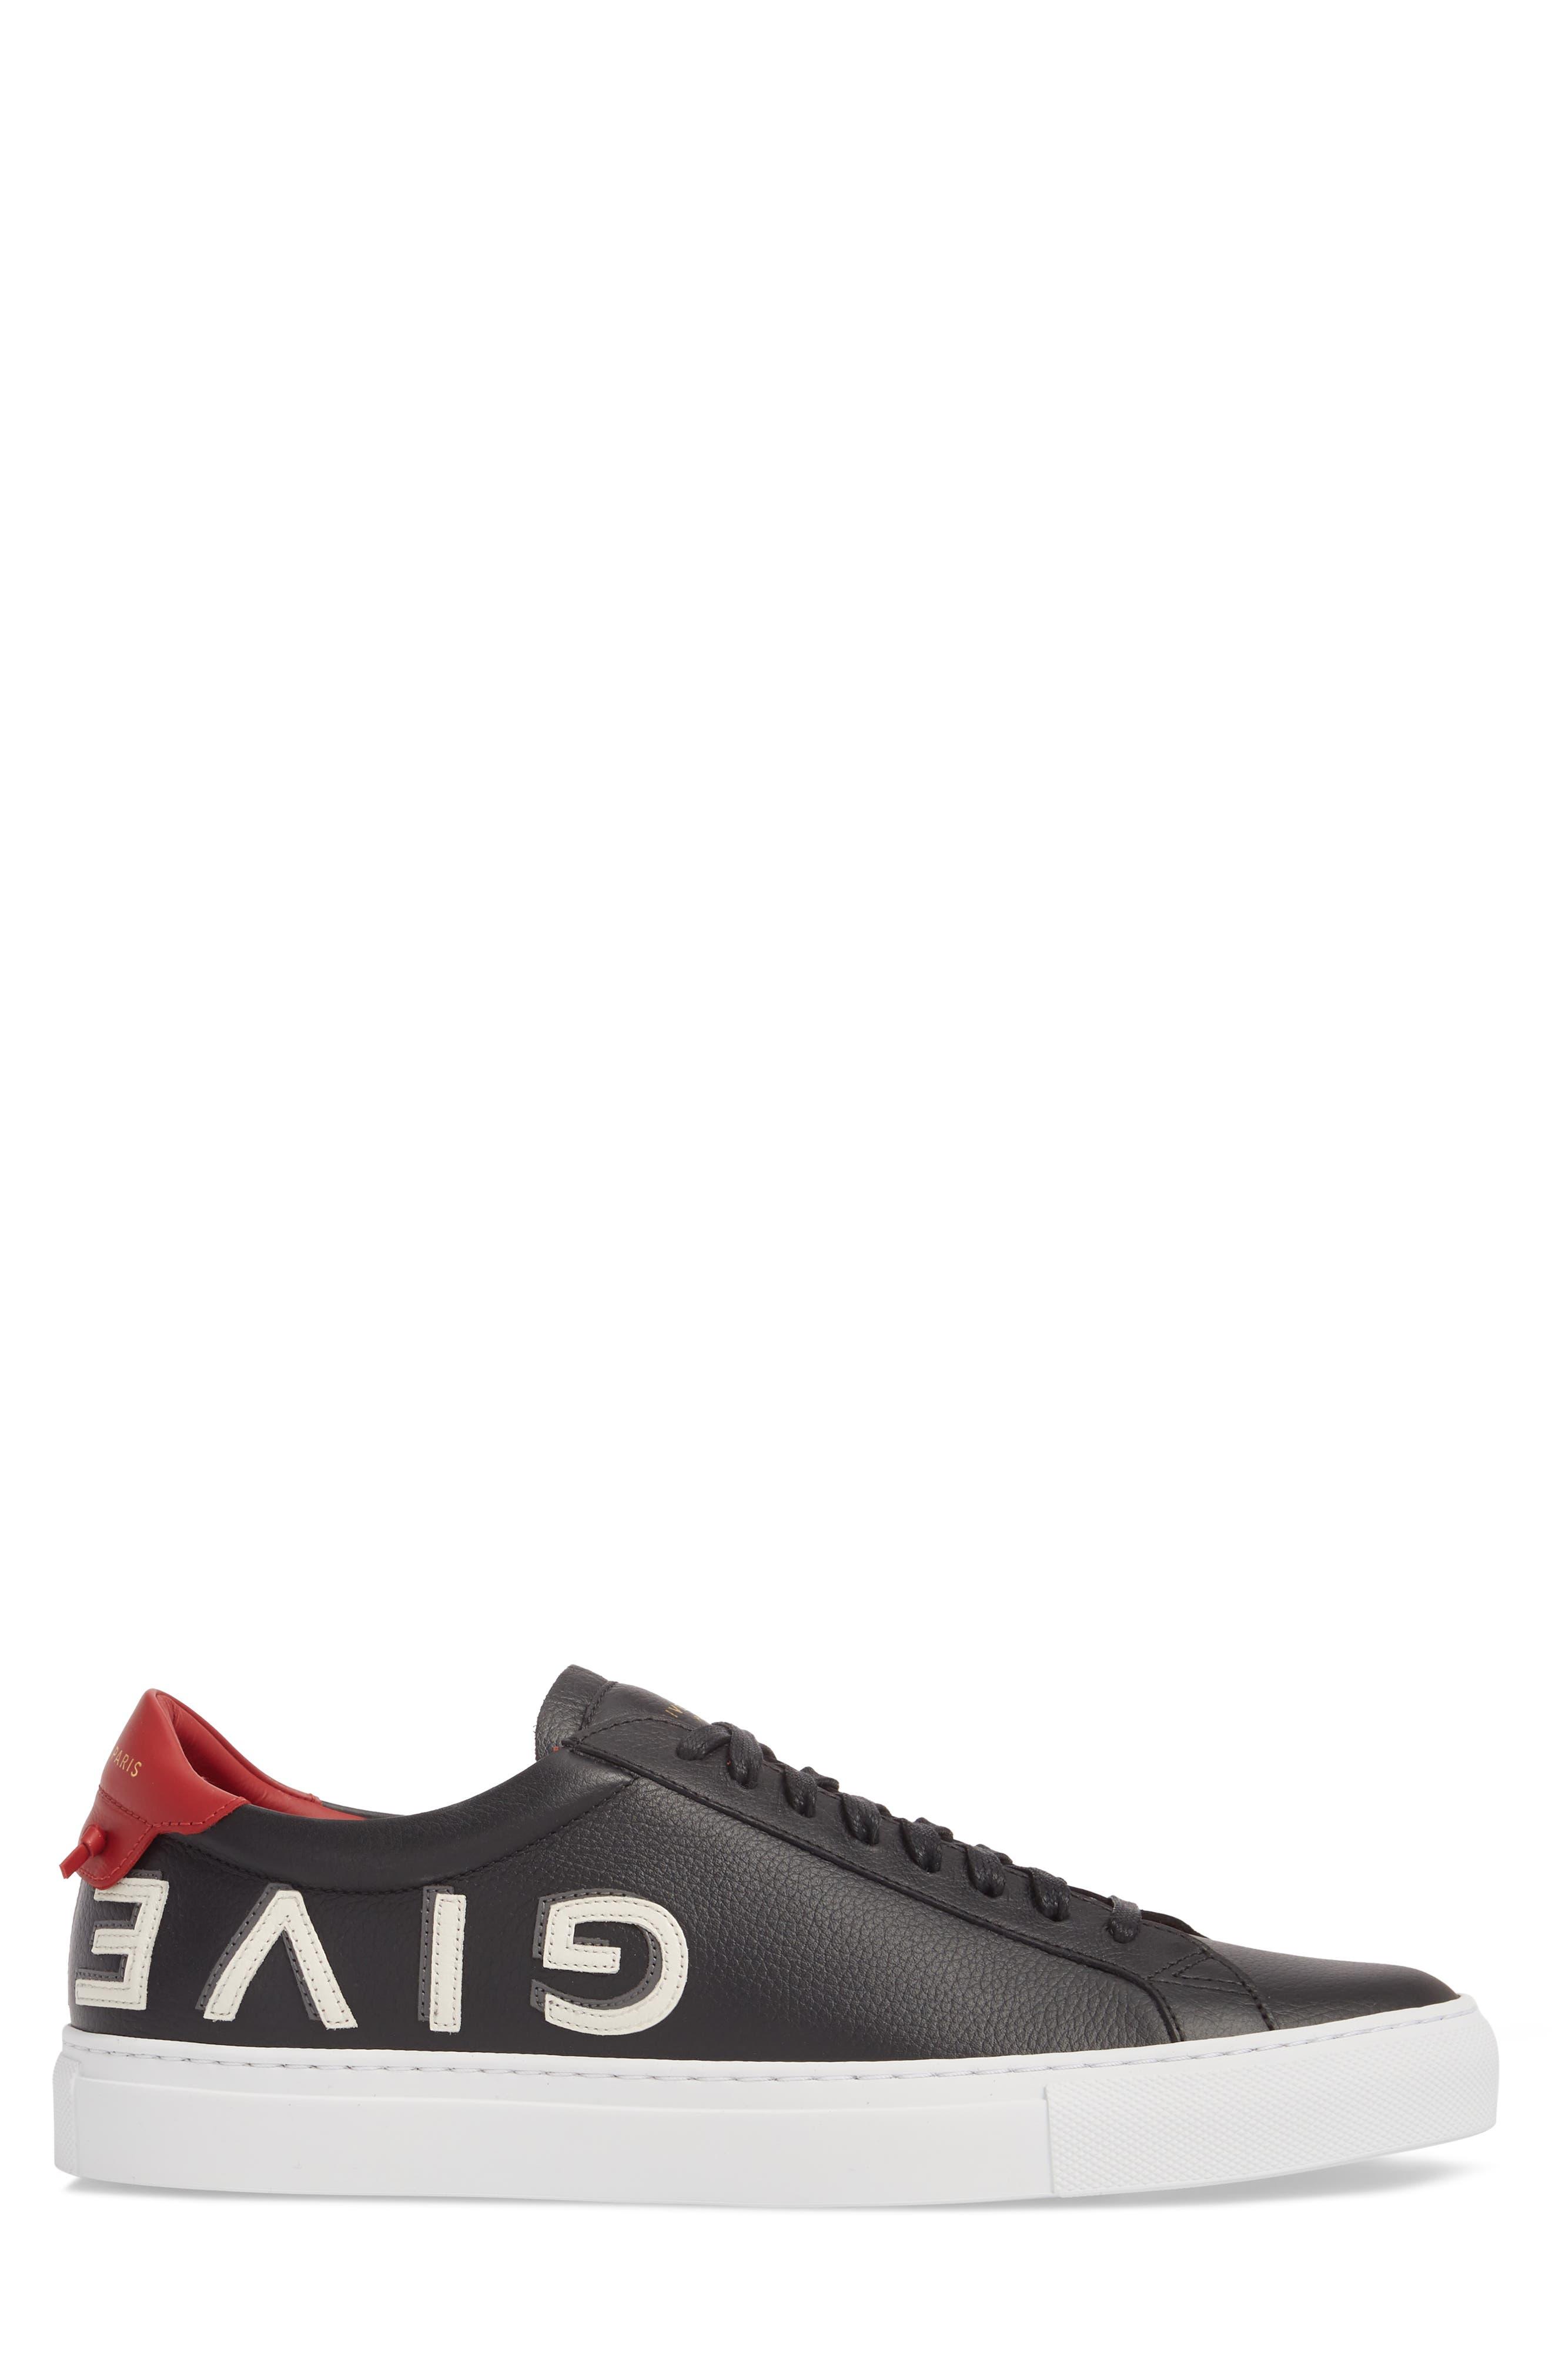 Urban Street Upside Down Sneaker,                             Alternate thumbnail 3, color,                             Black/ Red